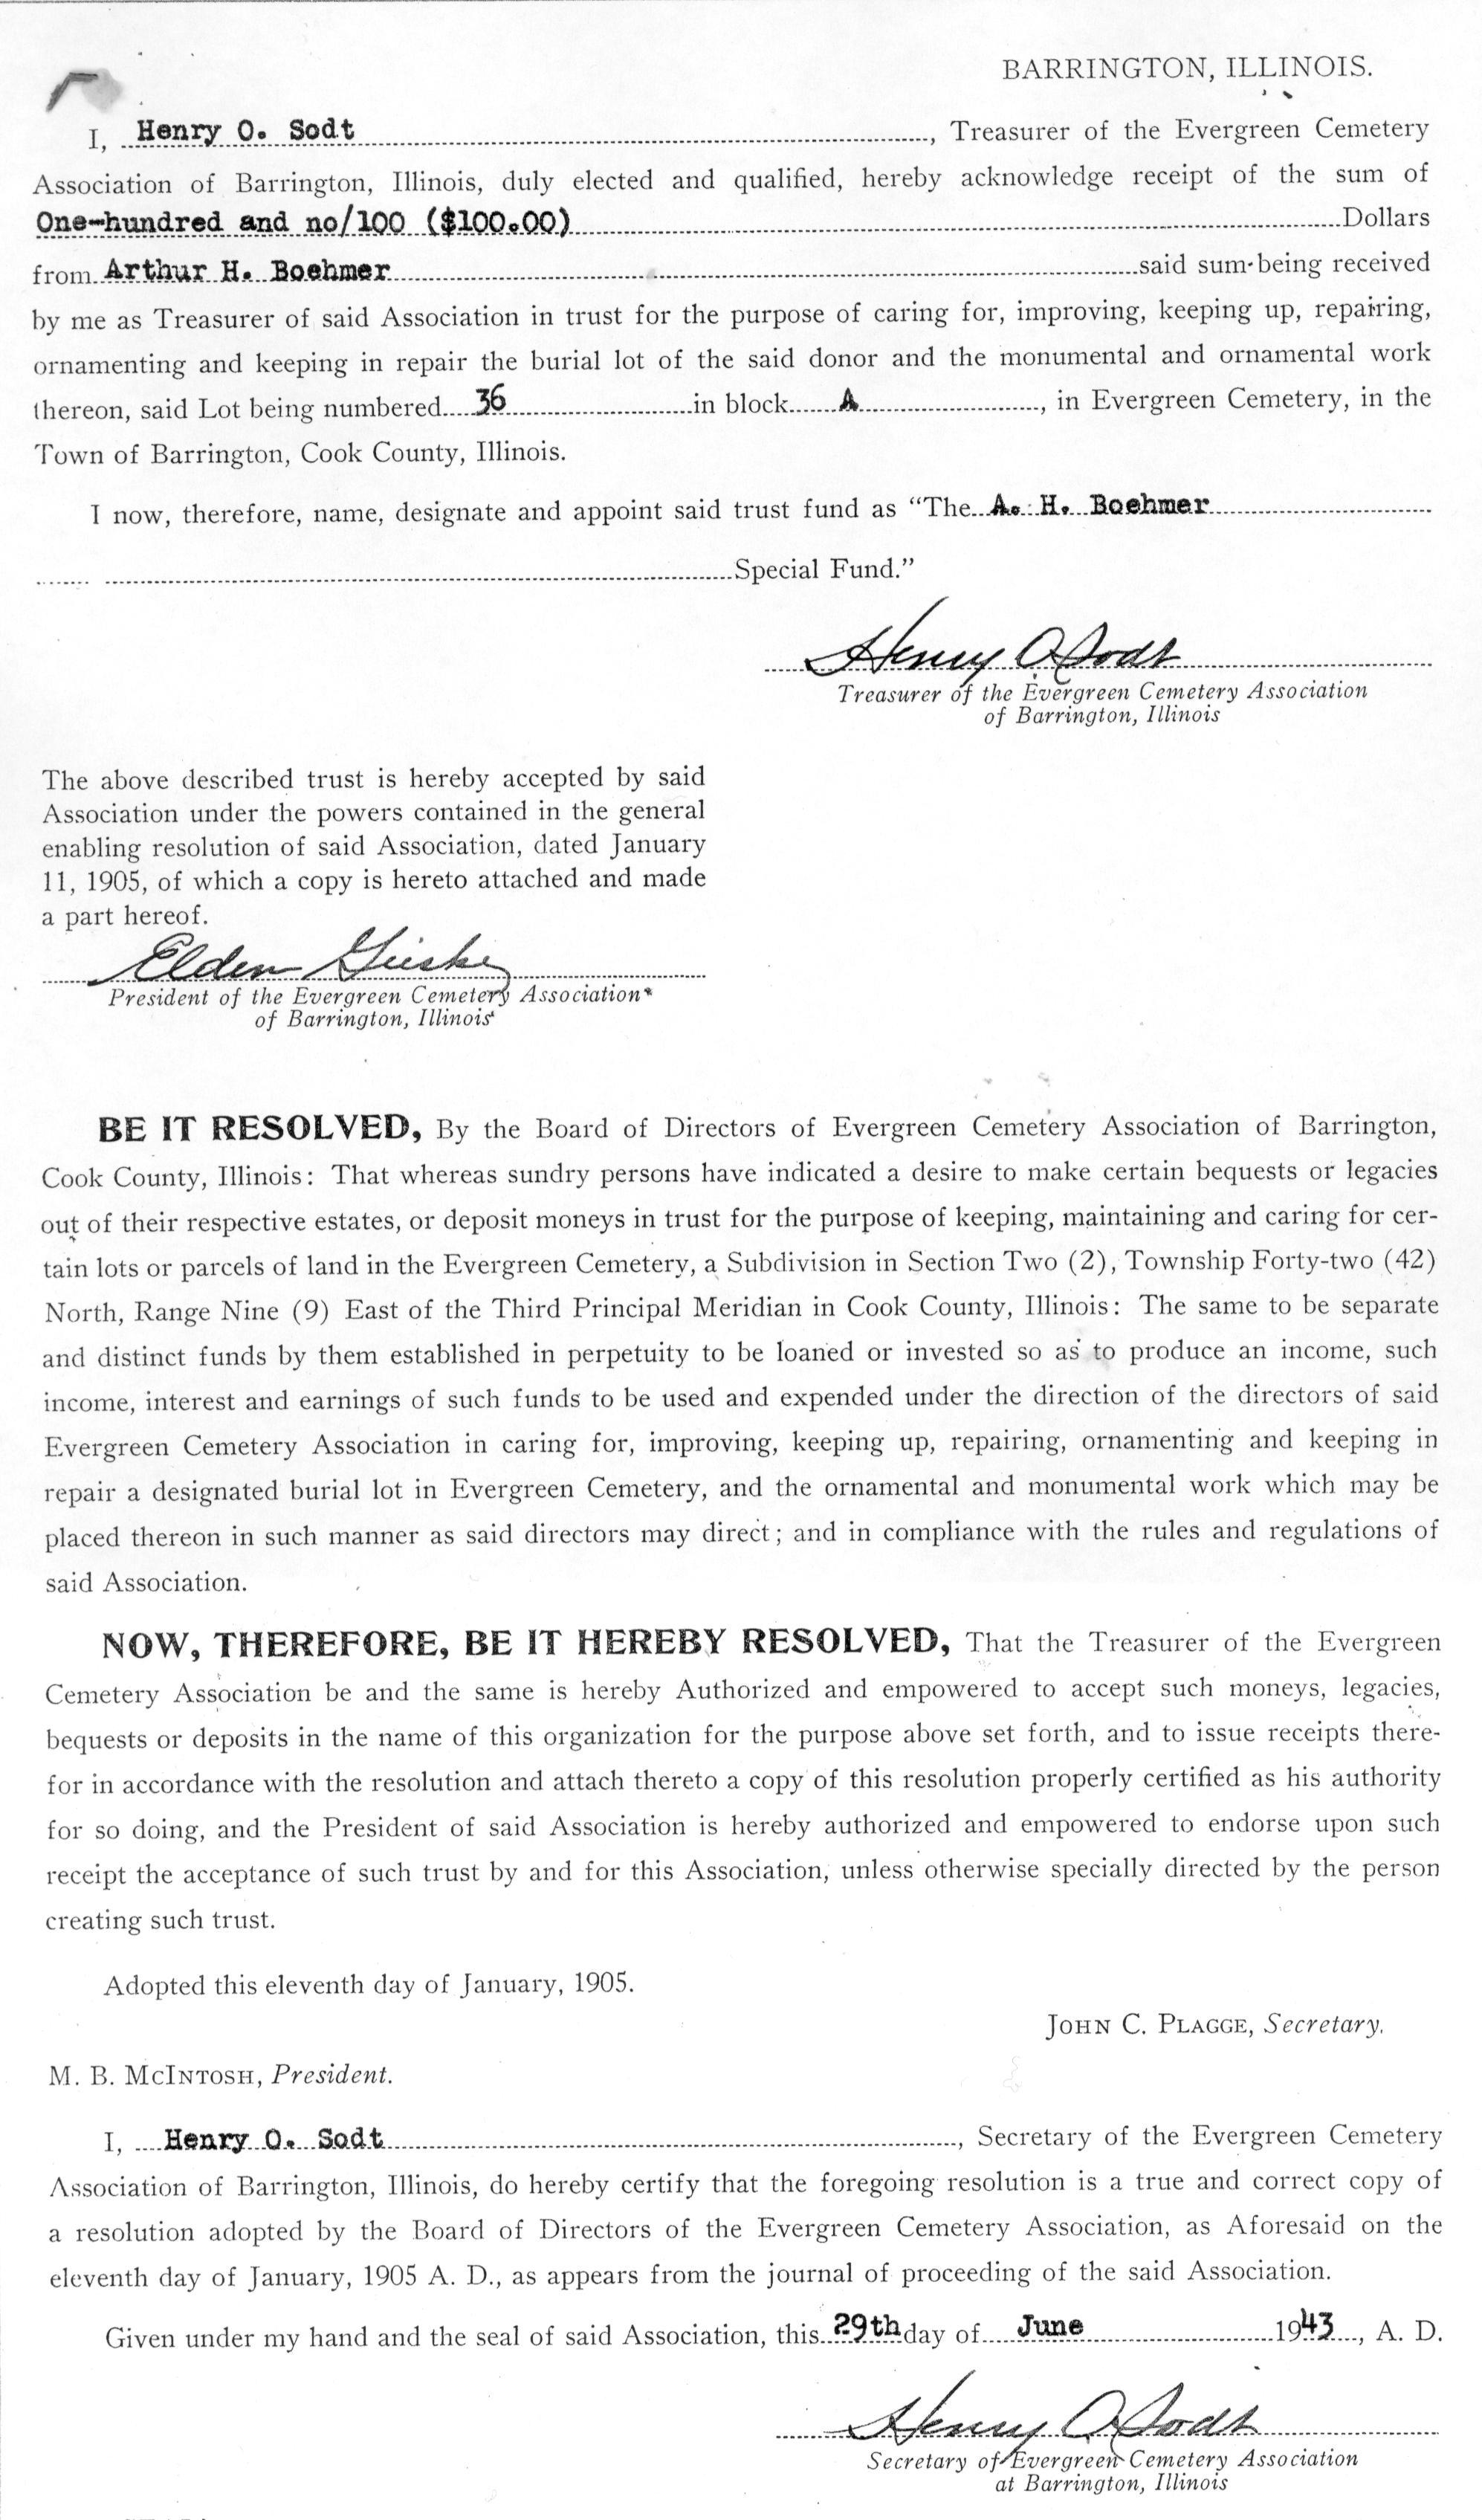 Boehmer, Arthur H (purchase Agreement)